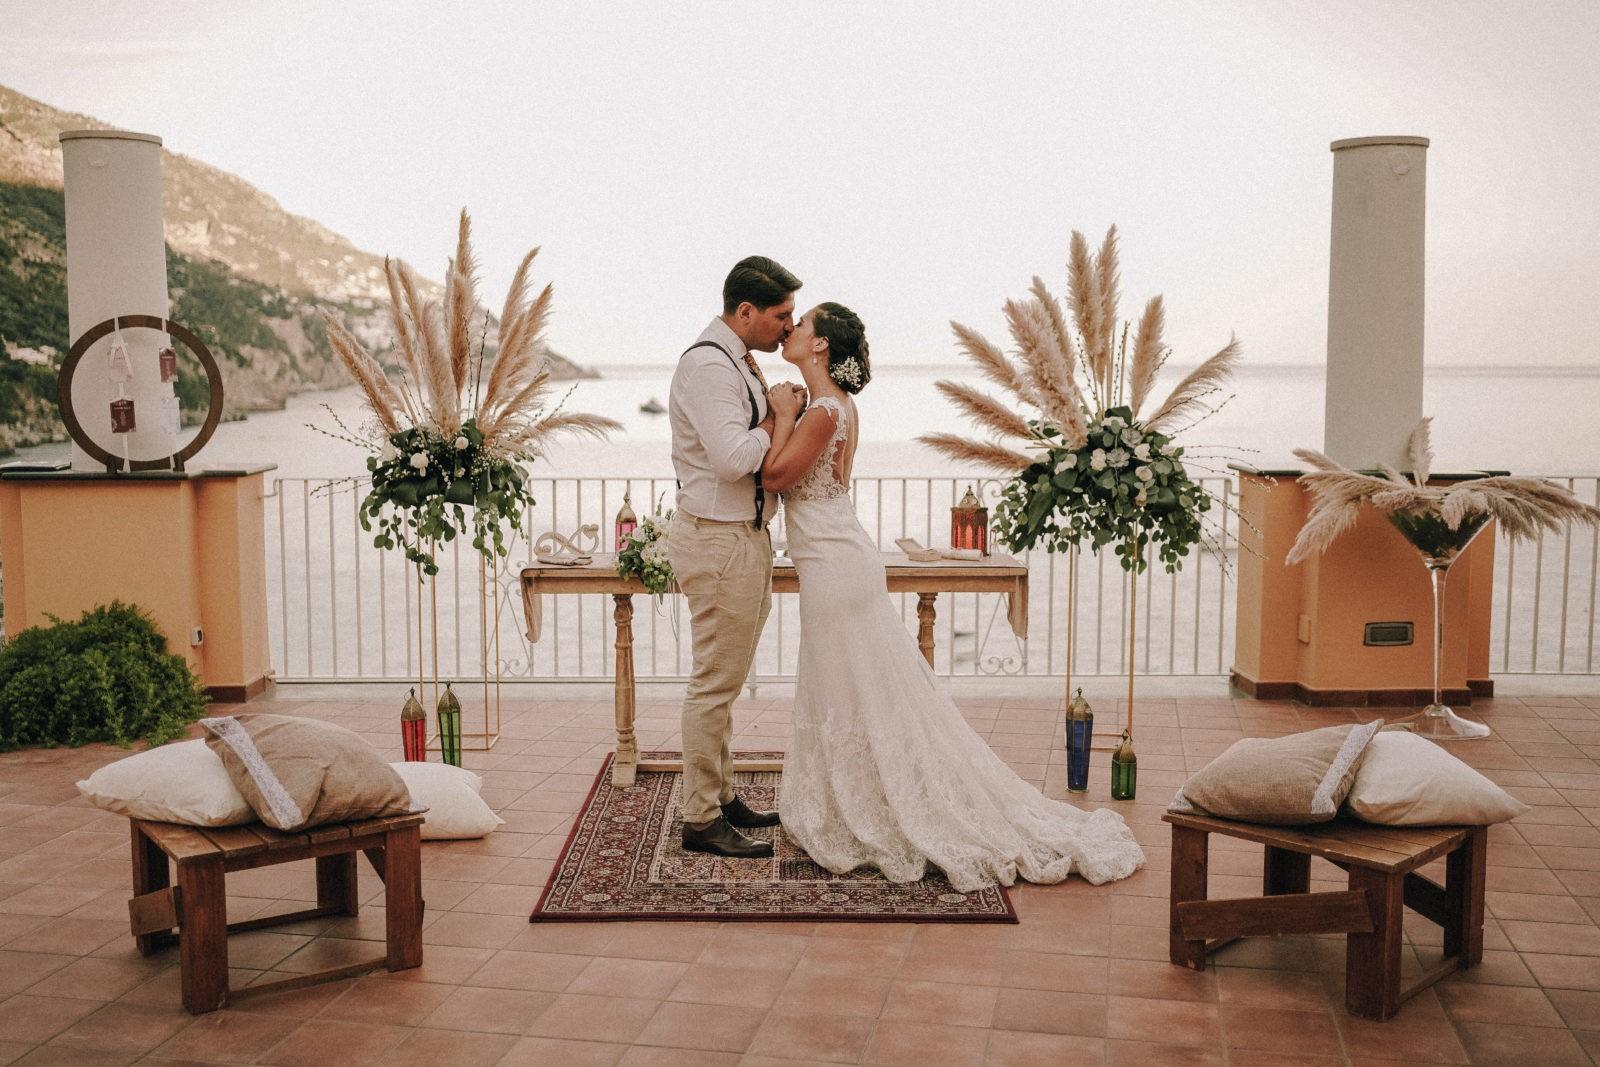 Matrimoni salvi: nessuna restrizione nella nuova ordinanza